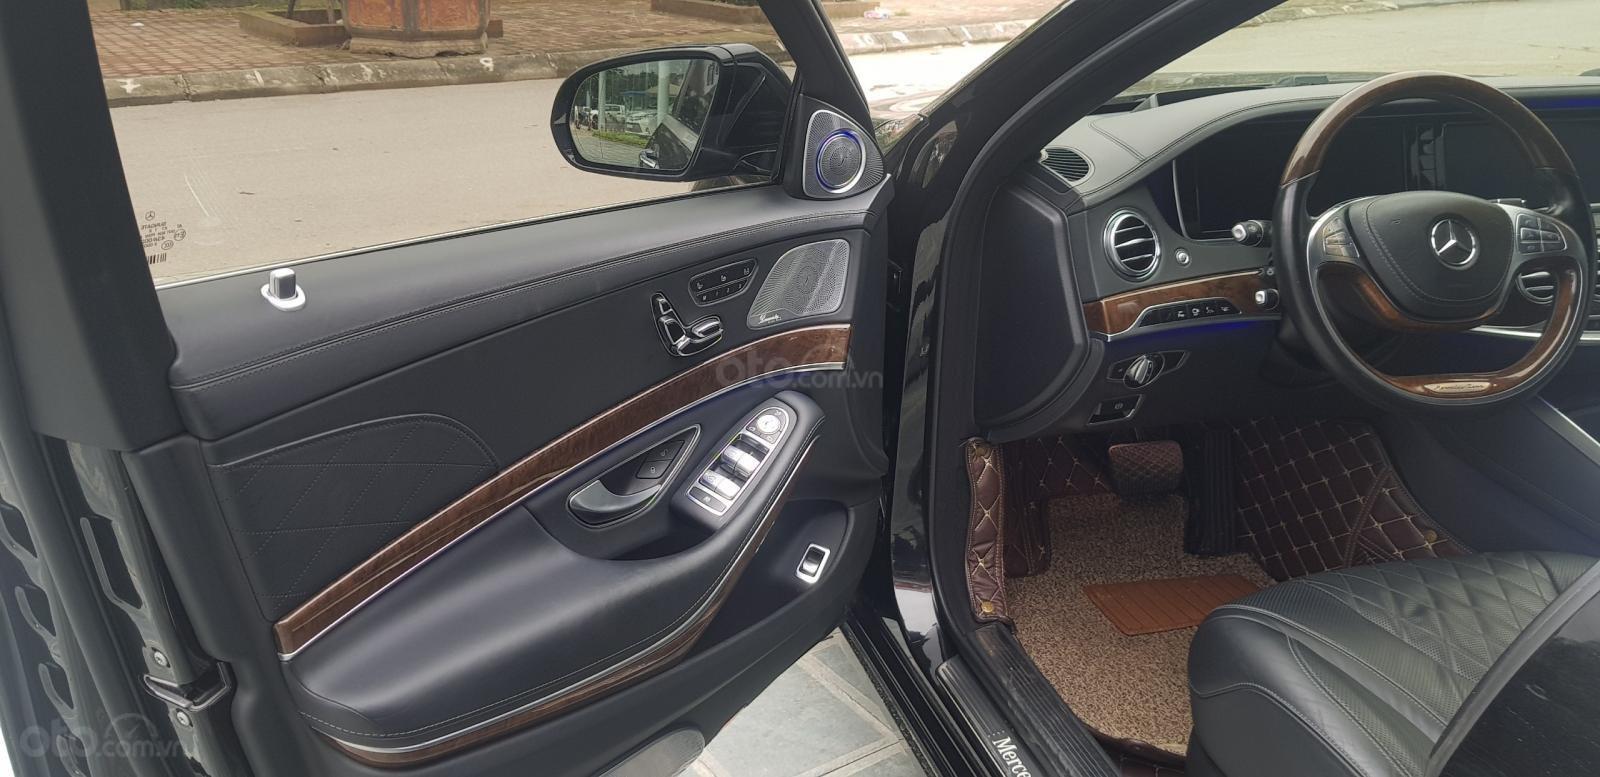 Bán Mercedes-Benz S500 SX 2016 màu đen, LH Ms  Hương 094.539.2468 (12)